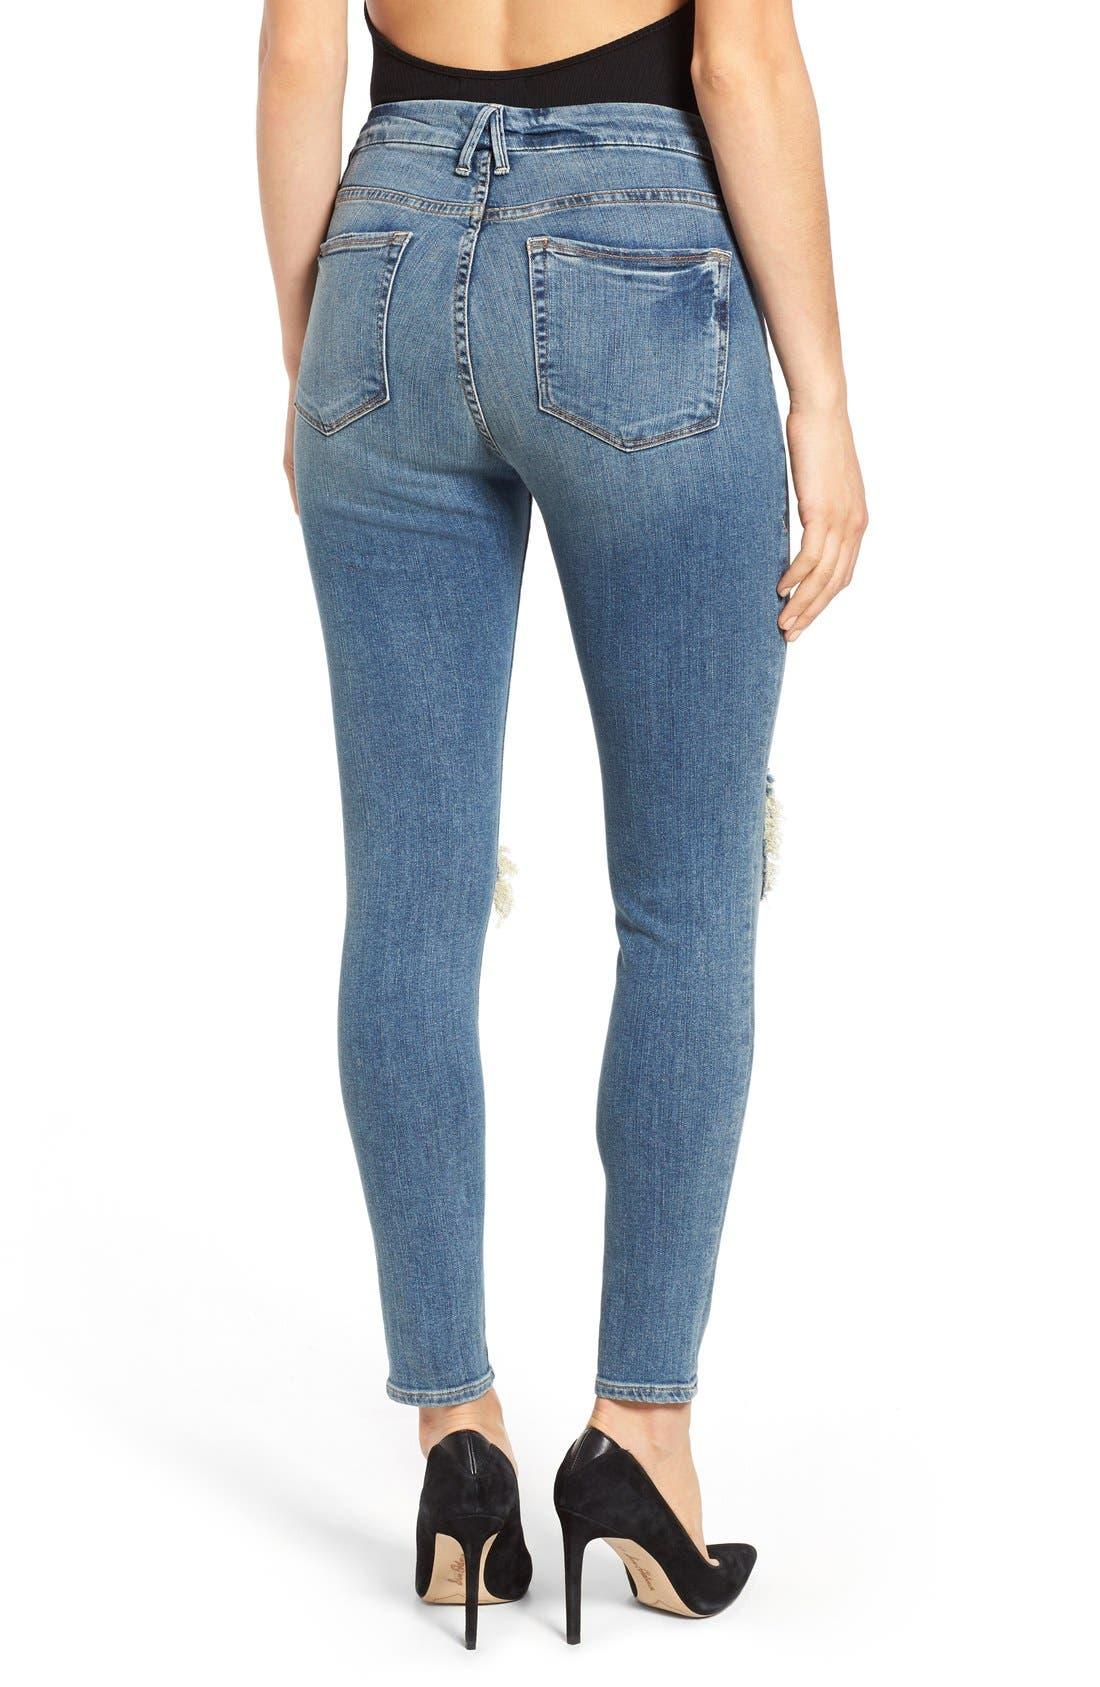 Alternate Image 2  - Good American Good Legs High Rise Ripped Skinny Jeans (Blue 006)